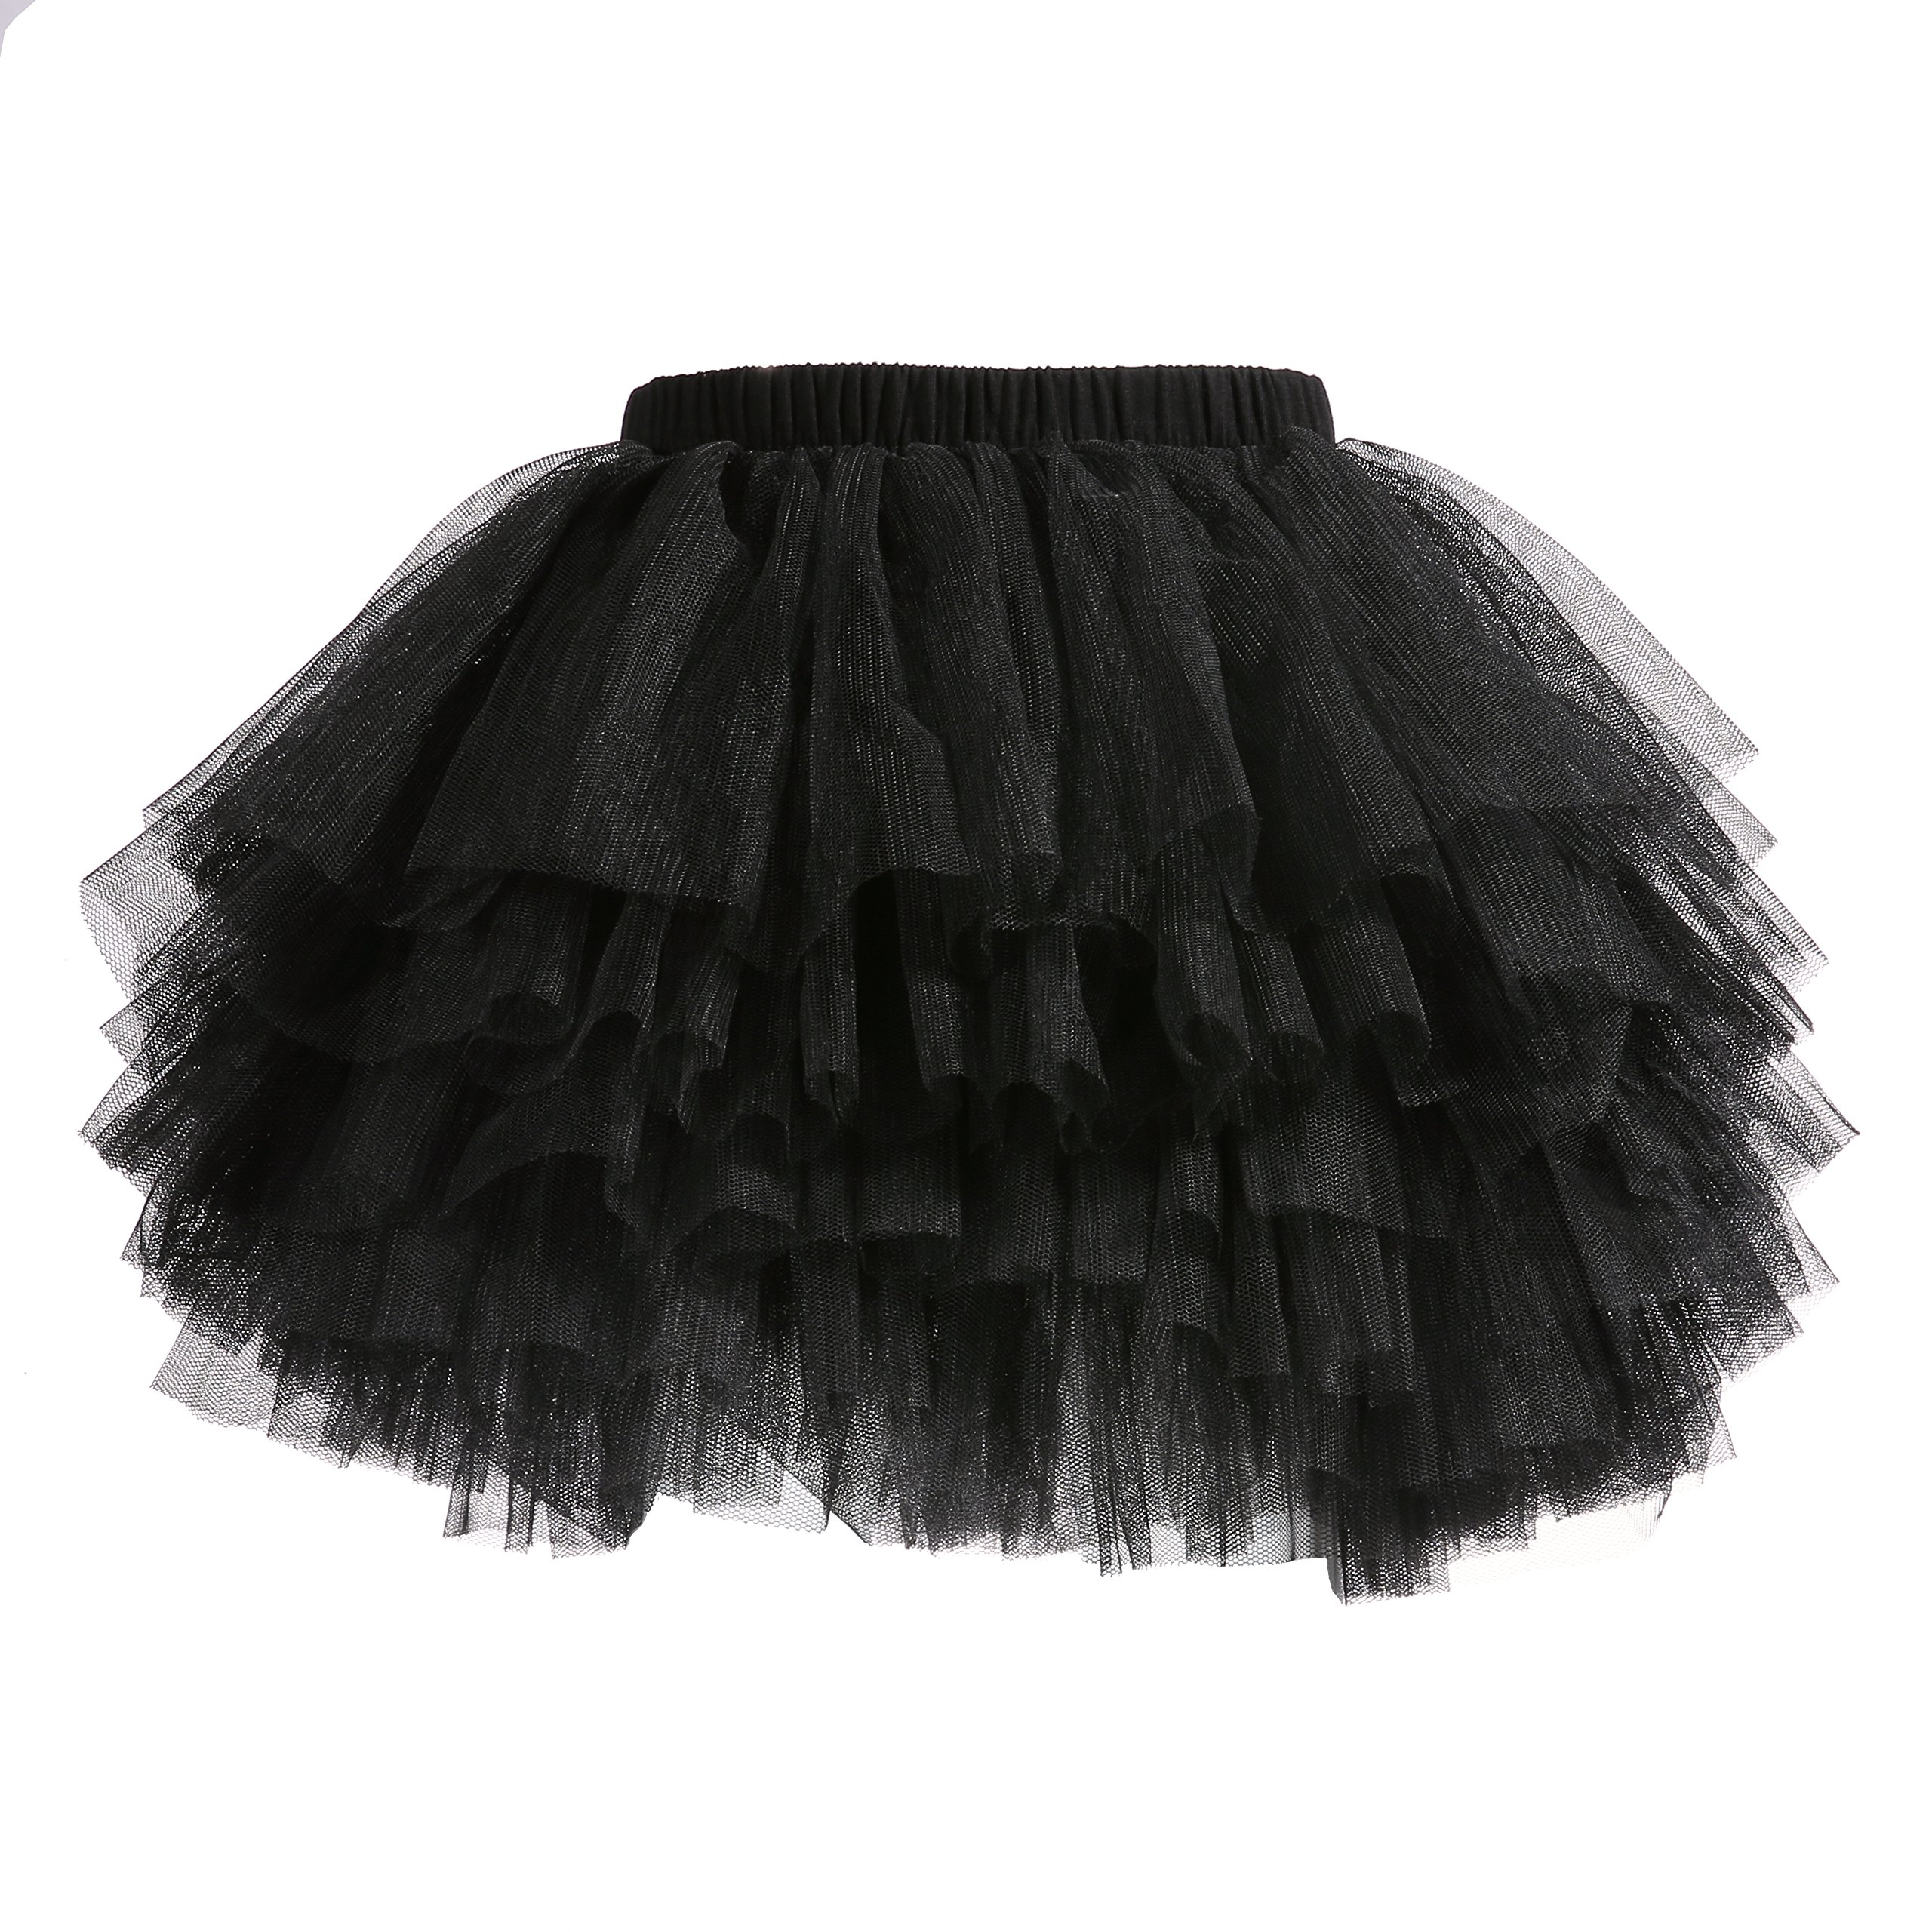 Baby Girls' Tutu Skirt Toddler 6 Layered Tulle Tutus 1-8T Black by Lucky-BB